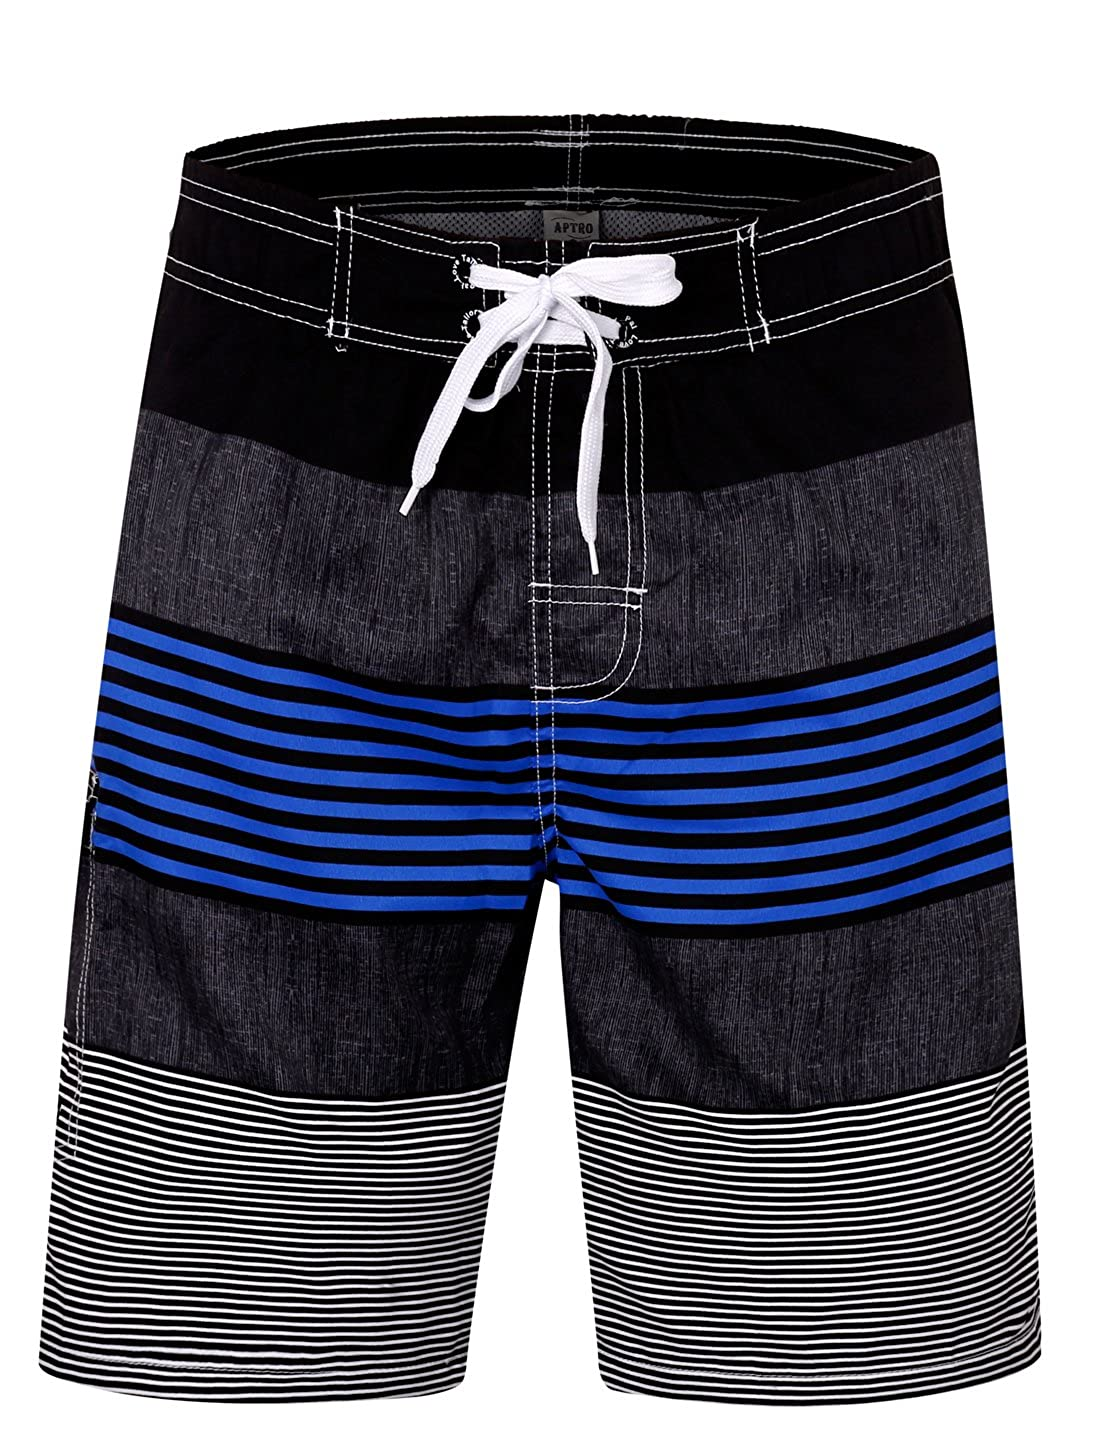 APTRO Men's Swim Trunks Beach Holiday Party Board Shorts Bathing Suits No Mesh